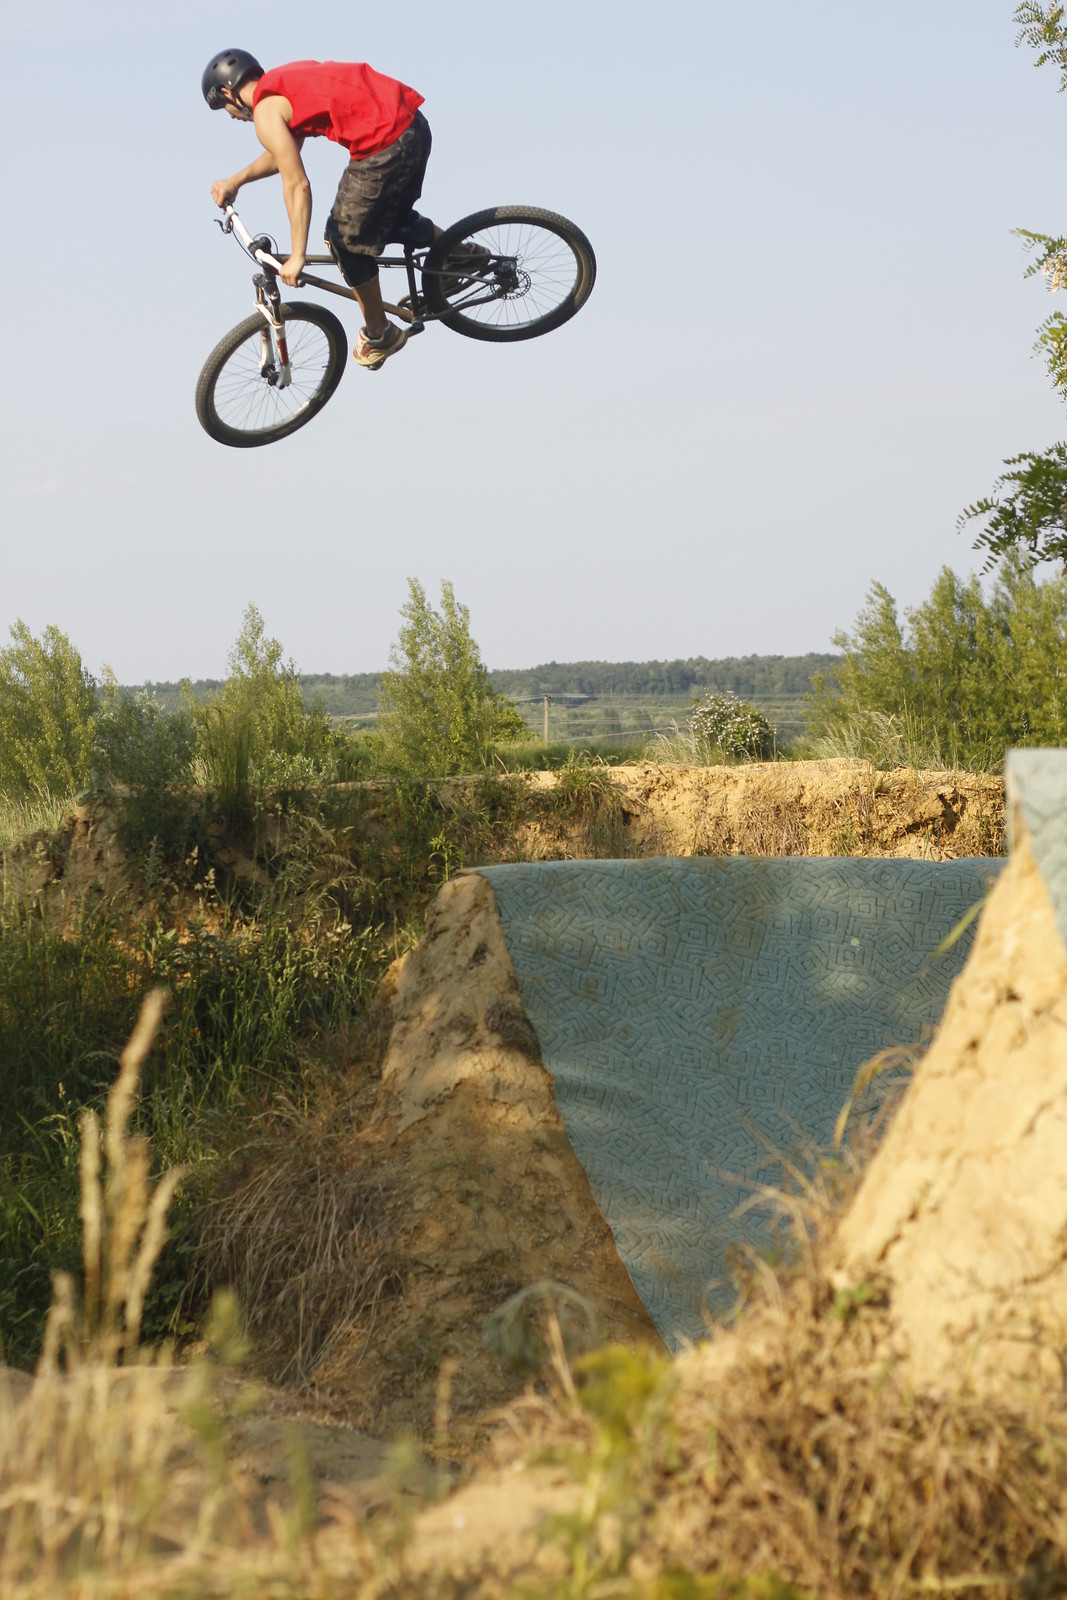 img 7133 - B Gabo - Mountain Biking Pictures - Vital MTB